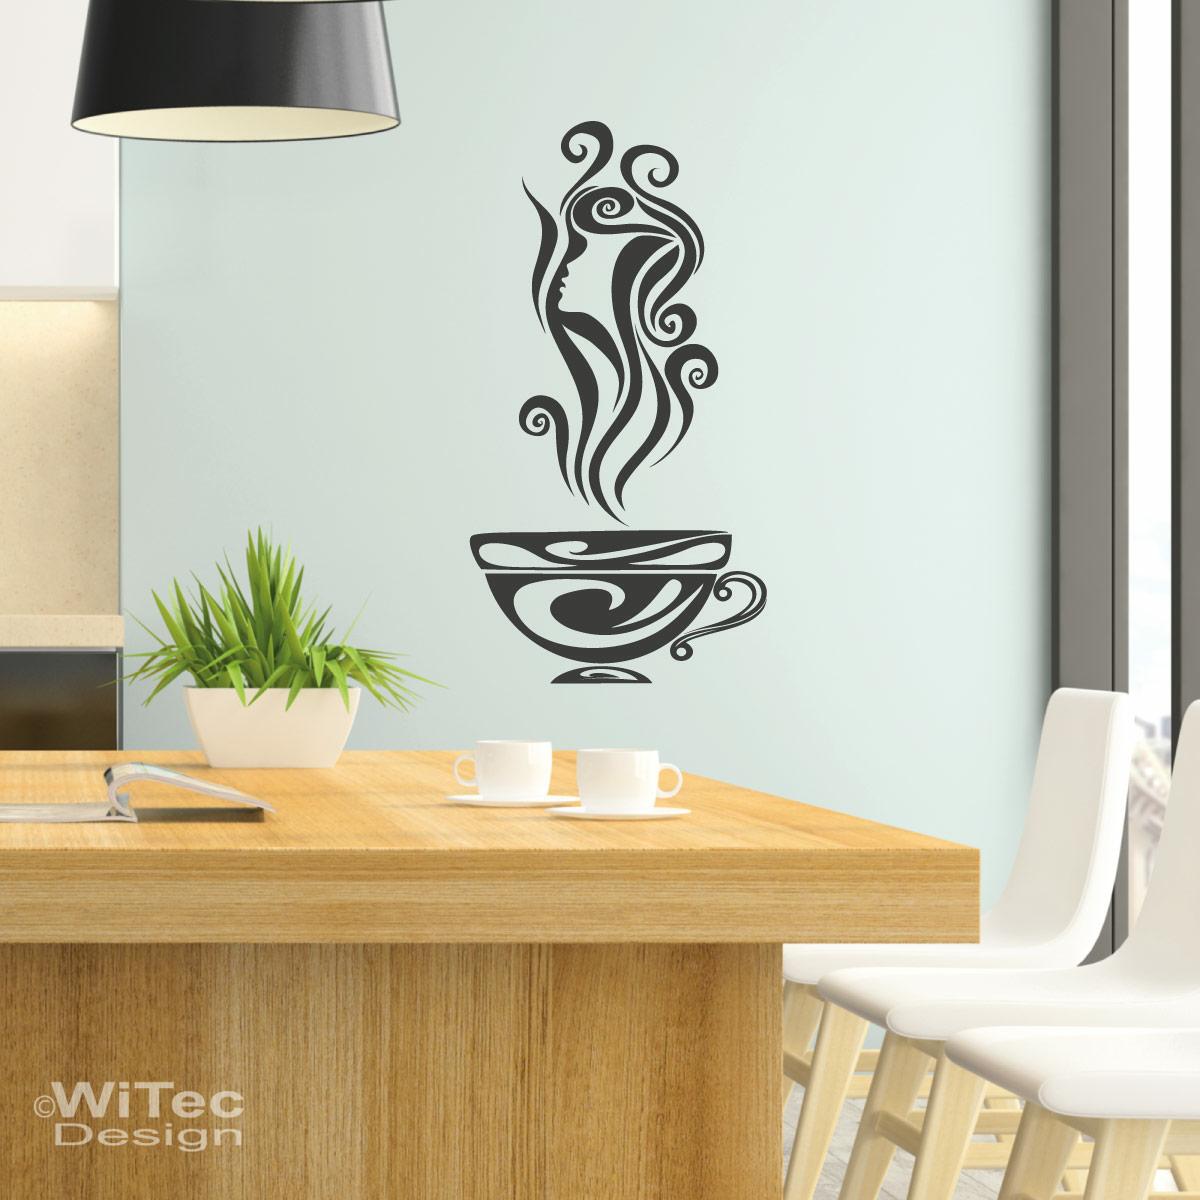 Wn207 wandaufkleber kaffee frau wandtattoo kuche for Wandtattoo küche kaffee